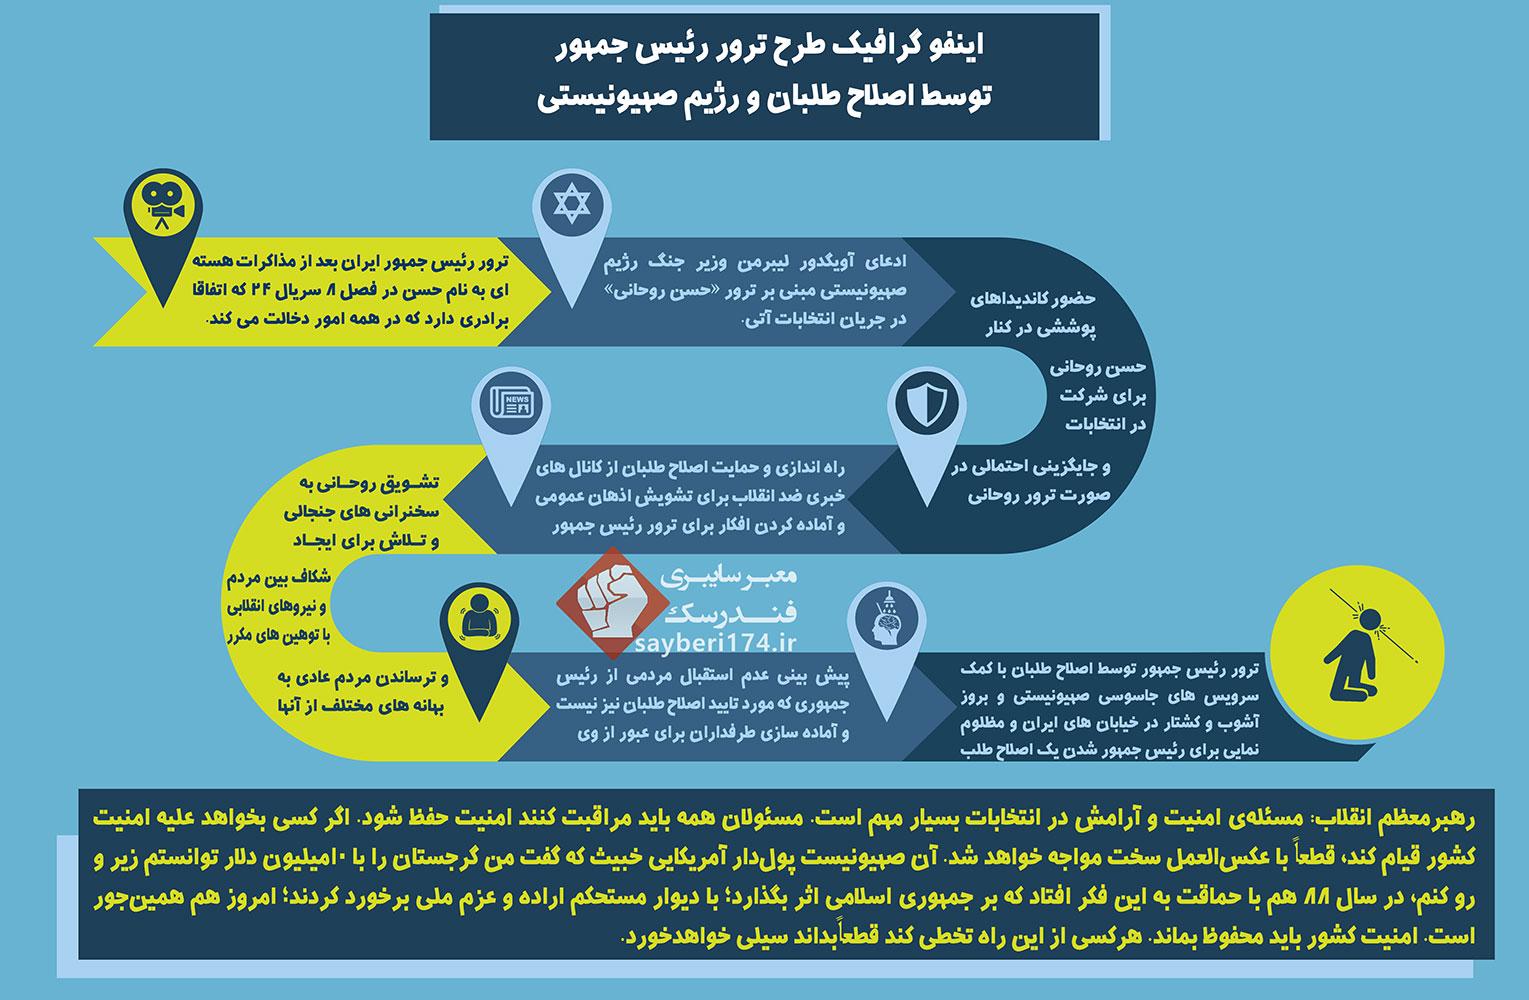 اینفوگرافیک ترور حسن روحانی